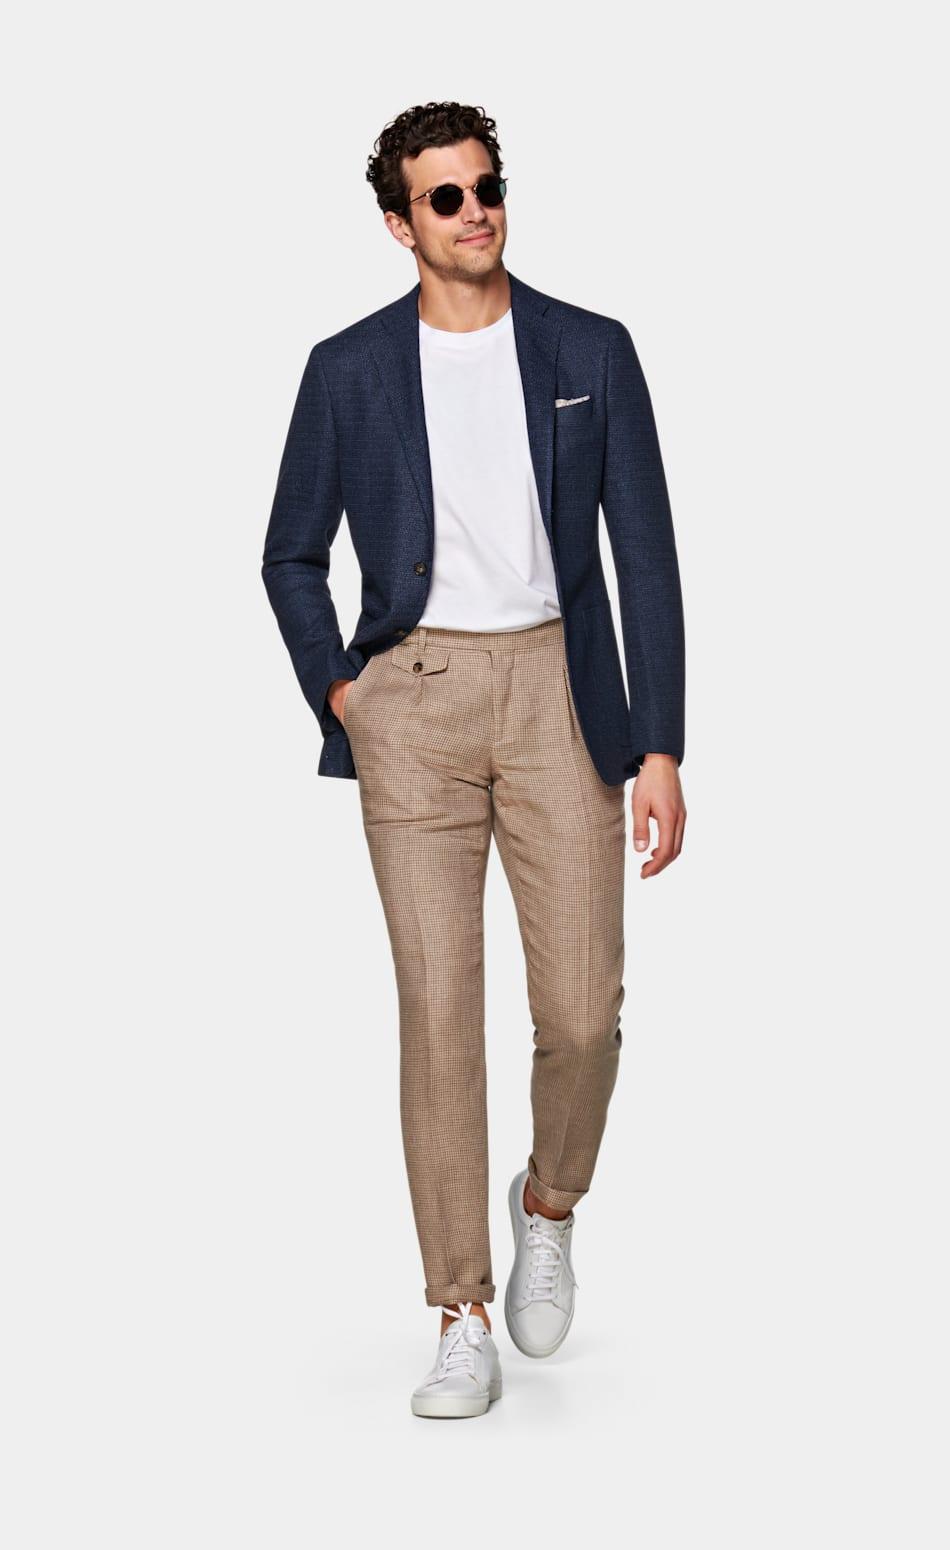 Dressing for Success for men